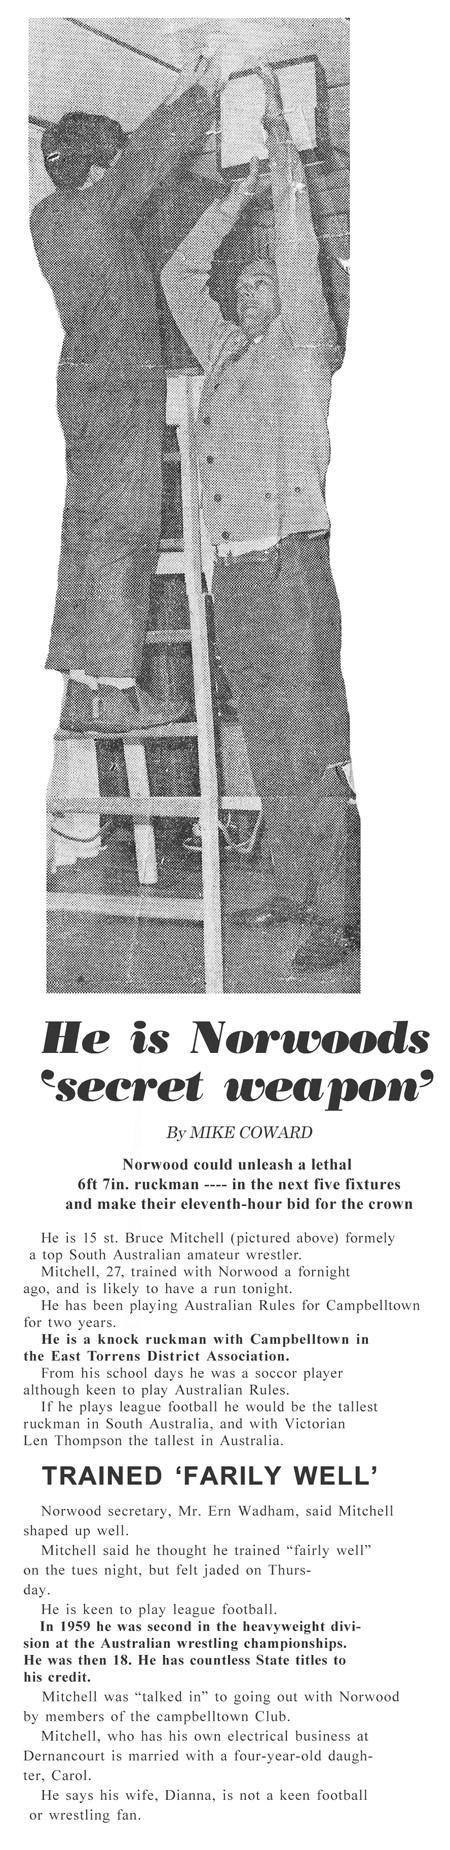 NorwoodsSecretWeaponbig